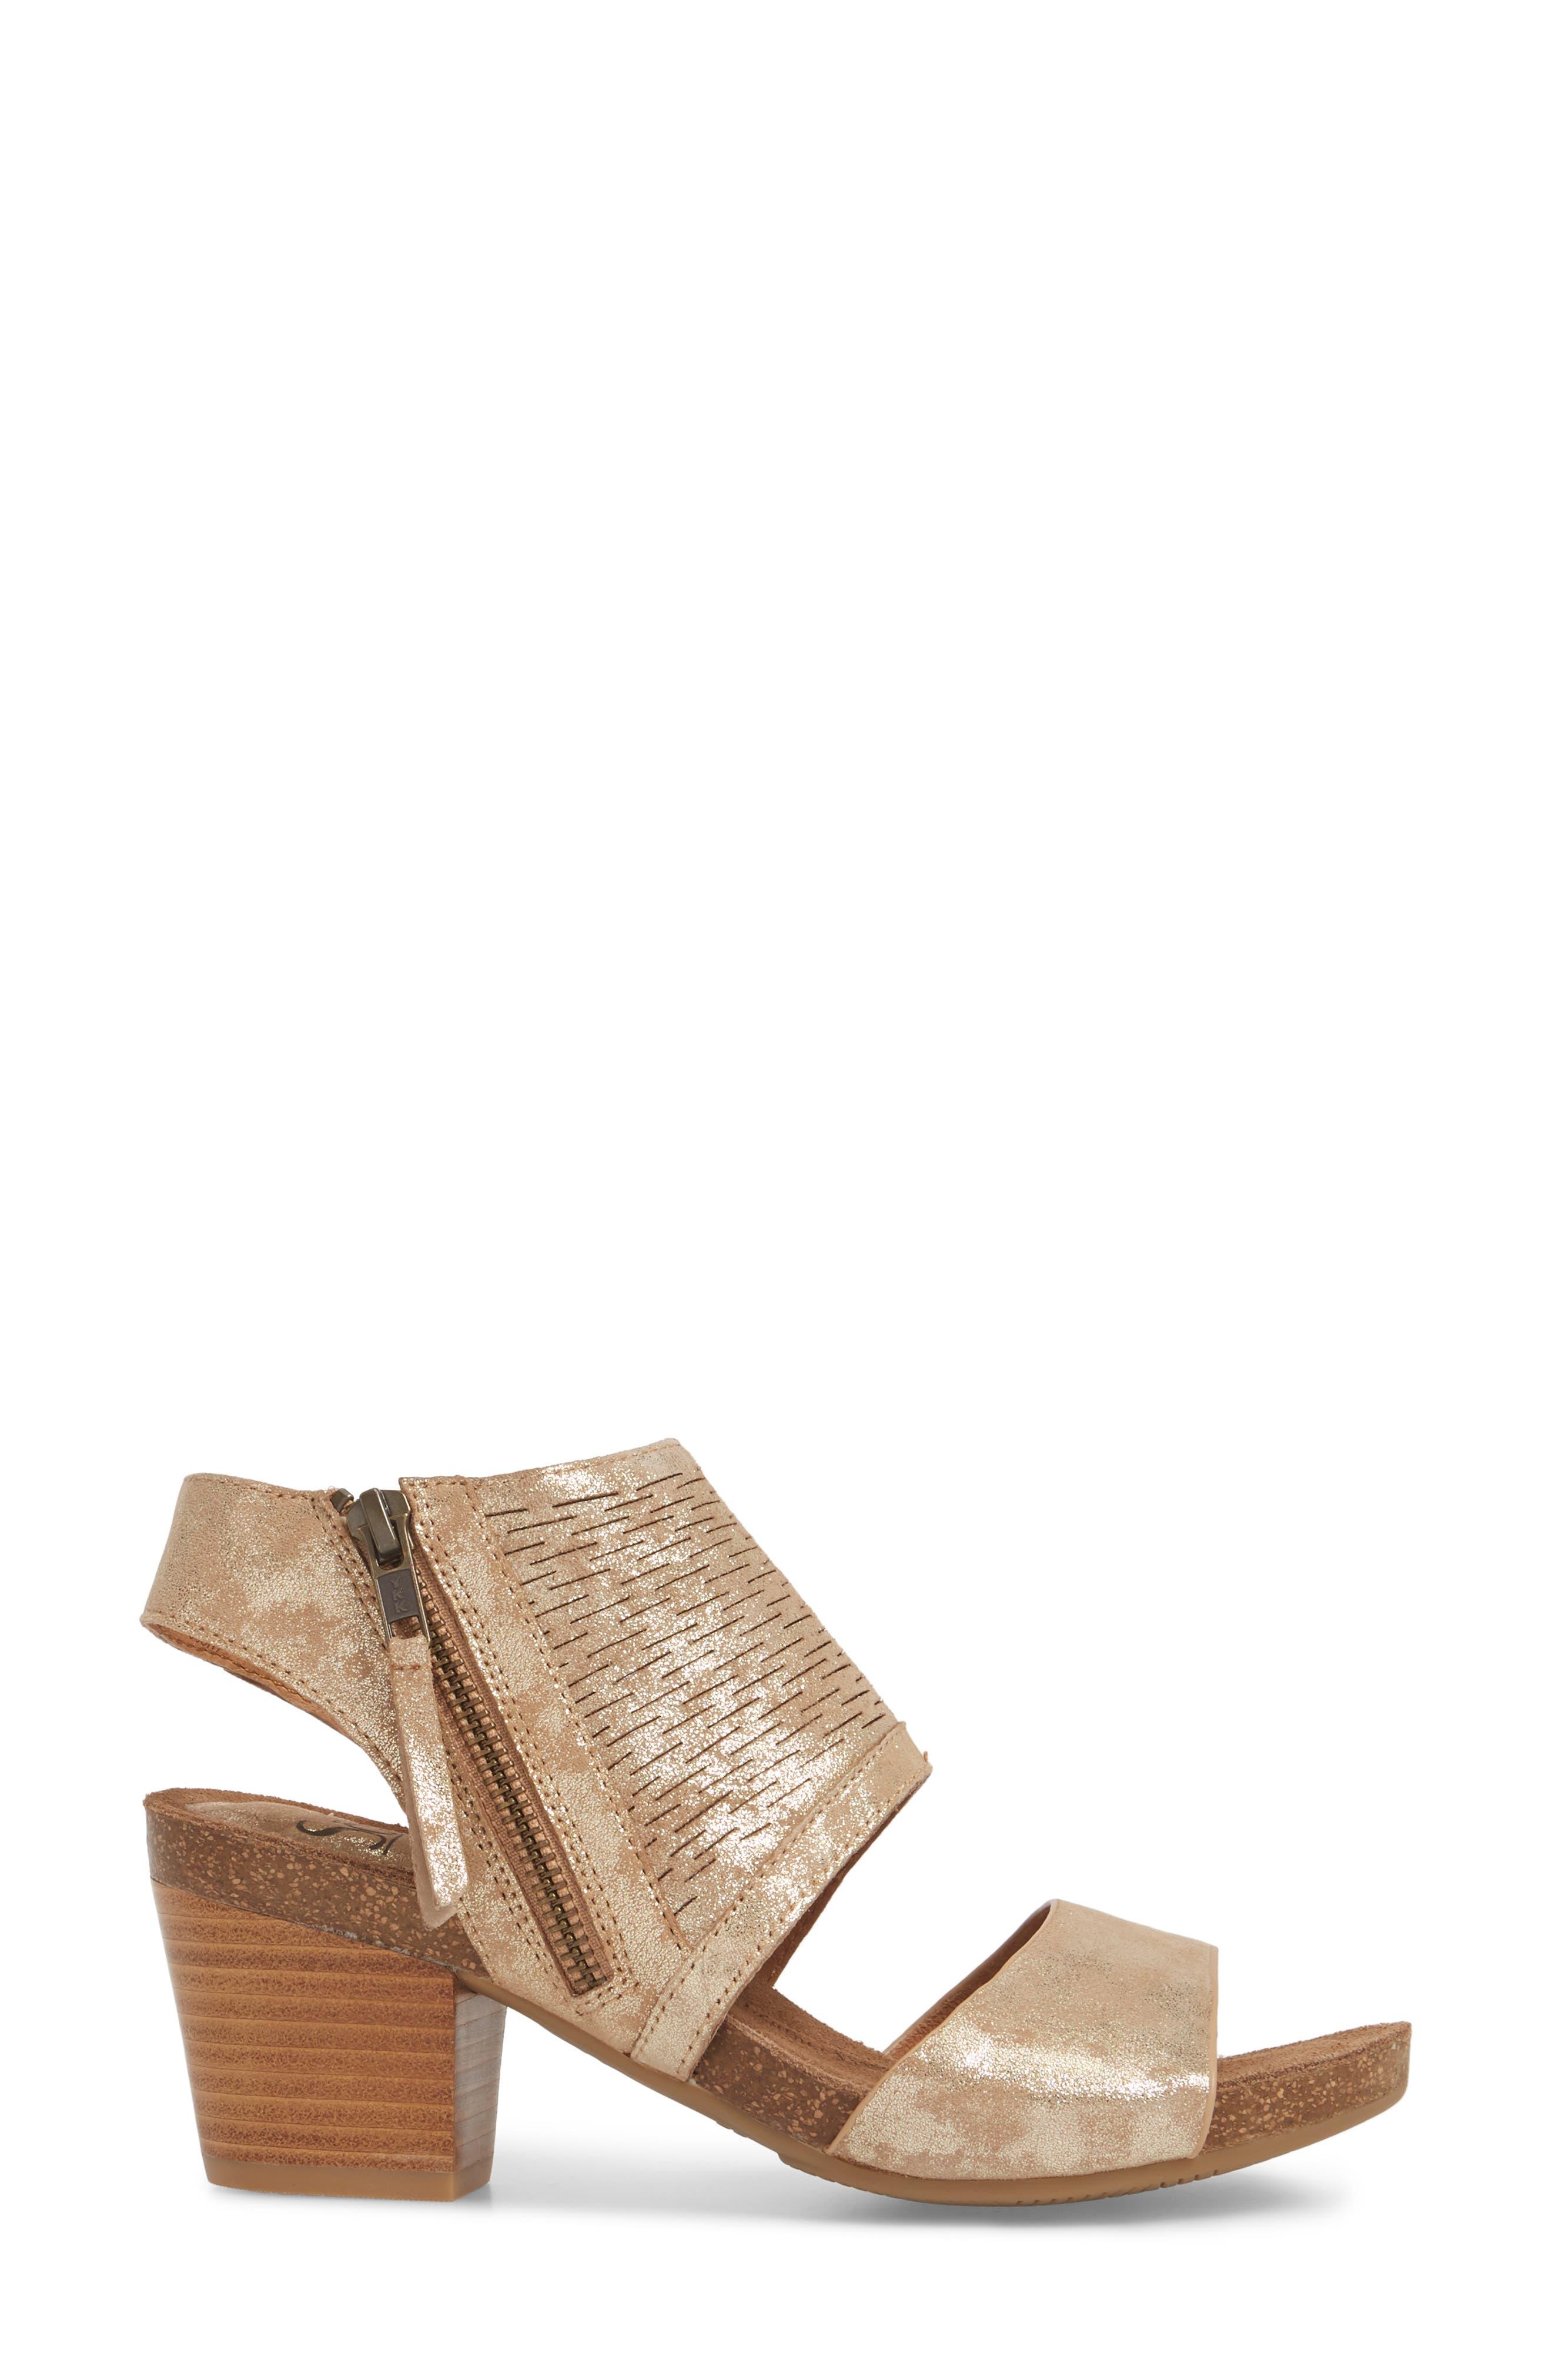 Milan Block Heel Sandal,                             Alternate thumbnail 3, color,                             PLATINO DISTRESSED FOIL SUEDE